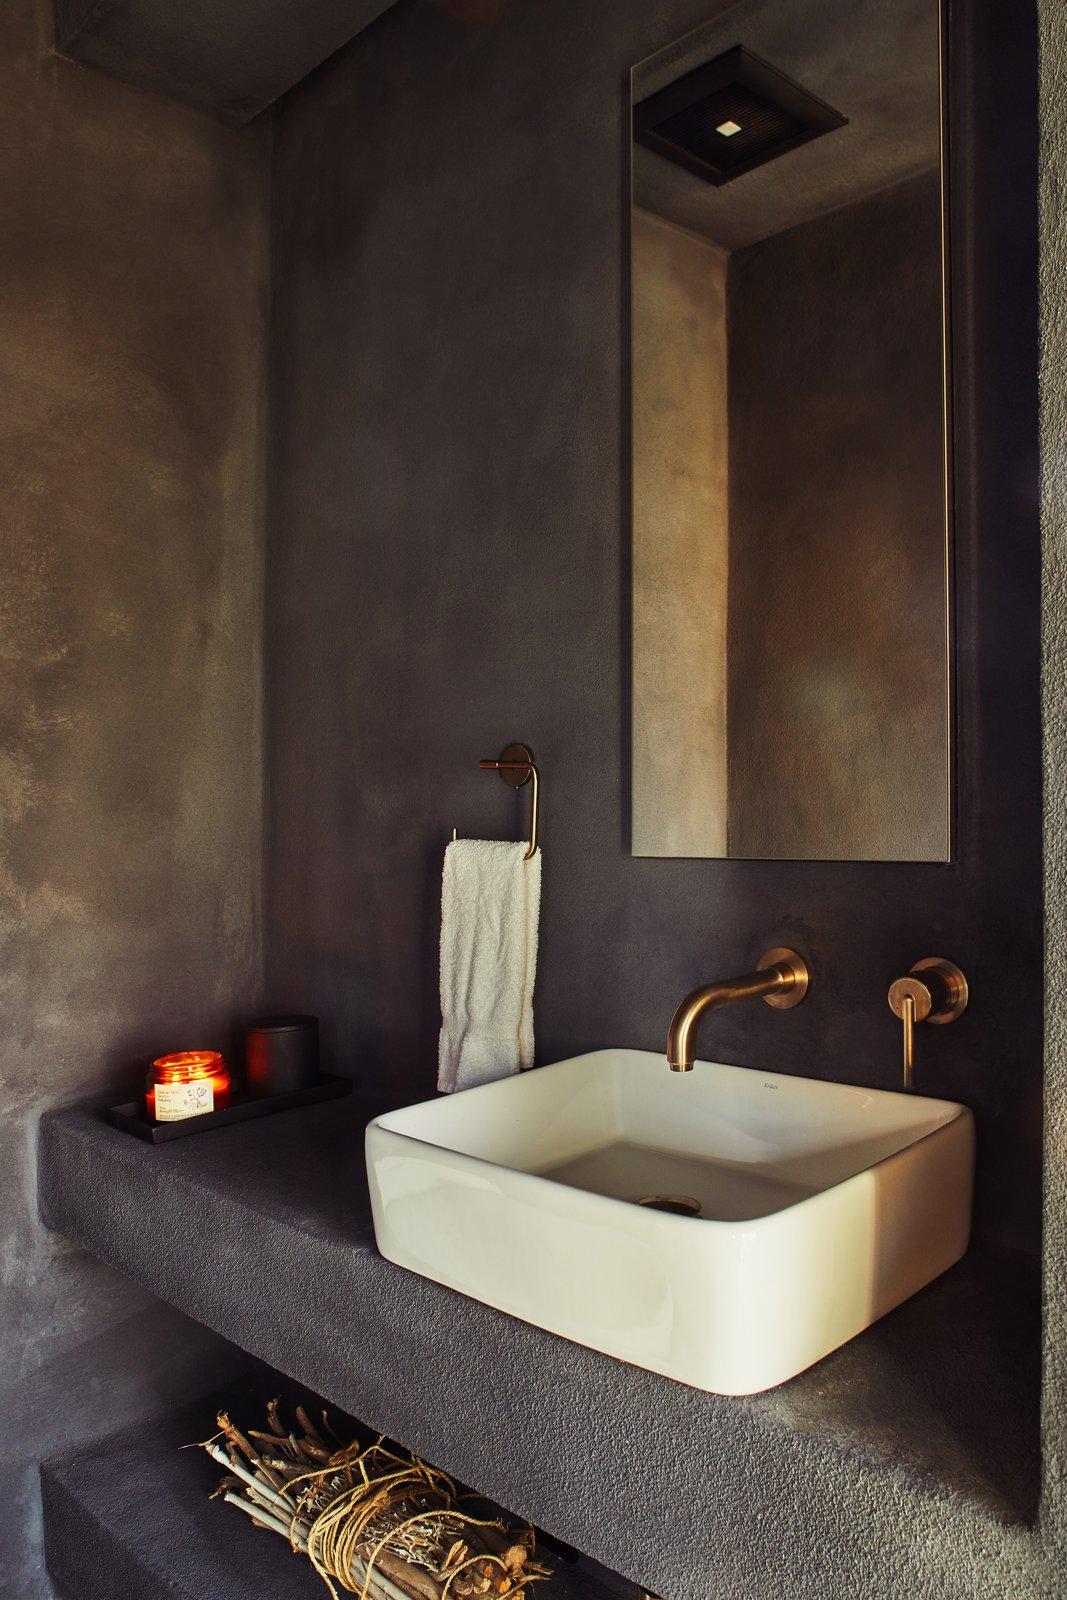 Delta Faucet Trinsic Single Handle Wall Mount Bathroom Faucet Trim